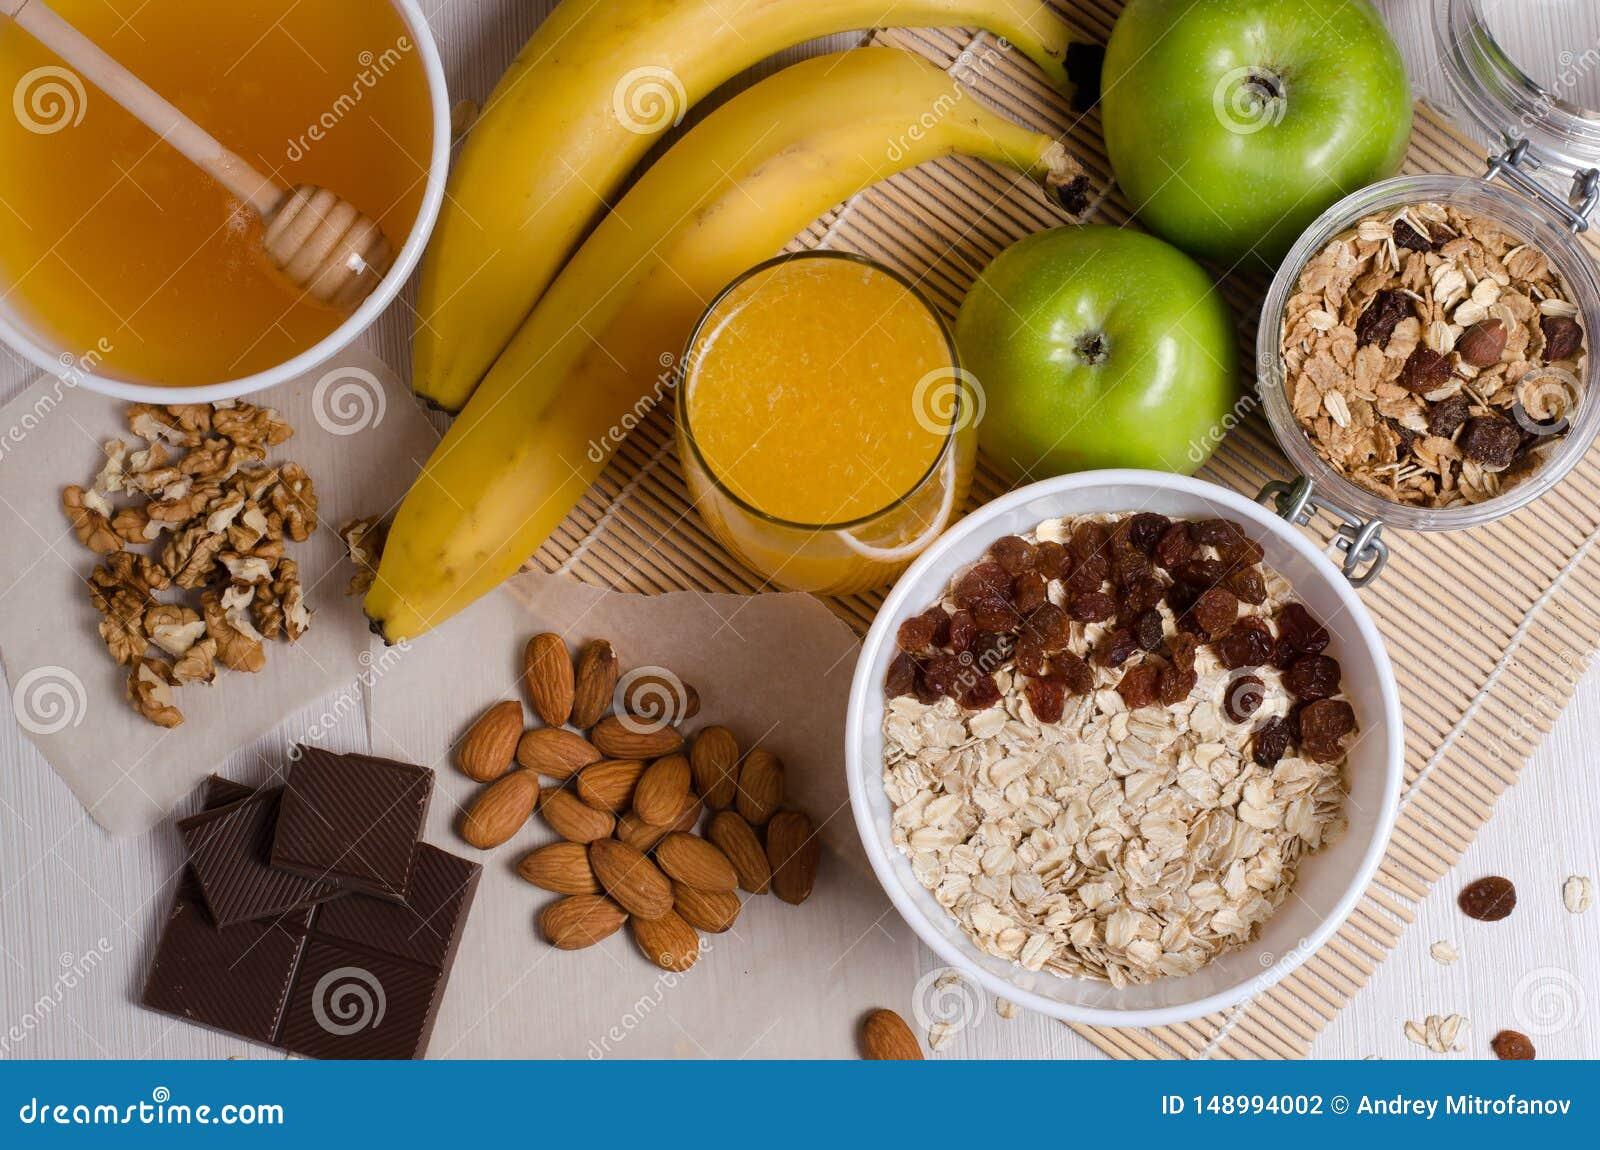 Healthy food. Fruit, homemade granola, nuts, chocolate, oatmeal